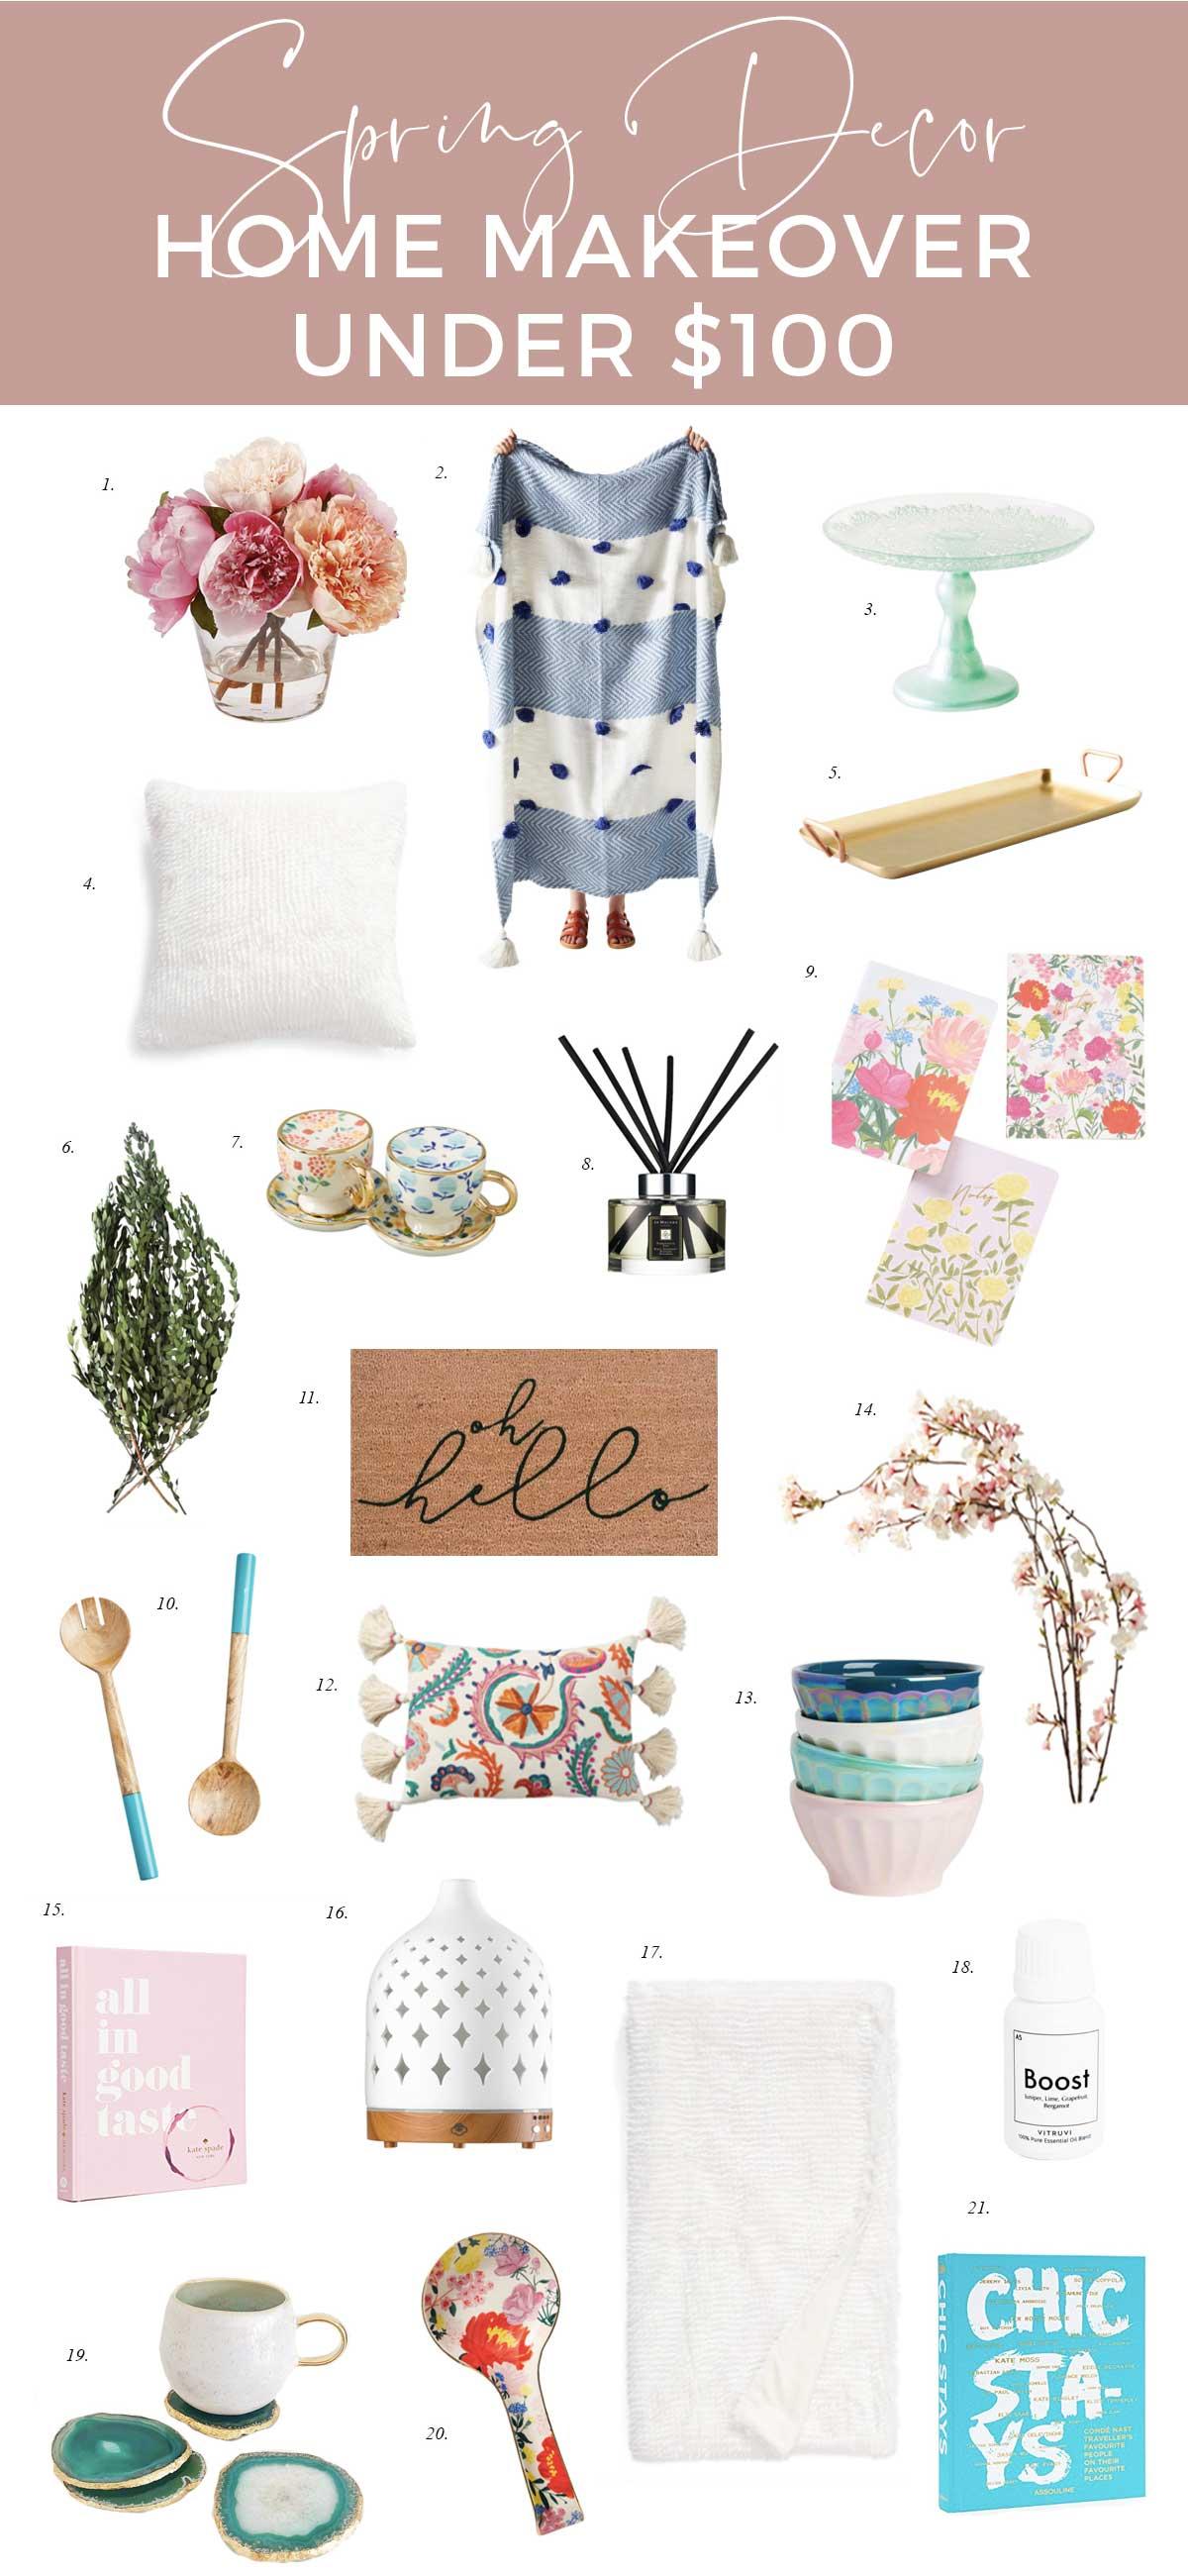 budget-home-makeover-tips-spring-decor-under-$100-oh-hello-door-mat-custom-boho-decor-spring-style